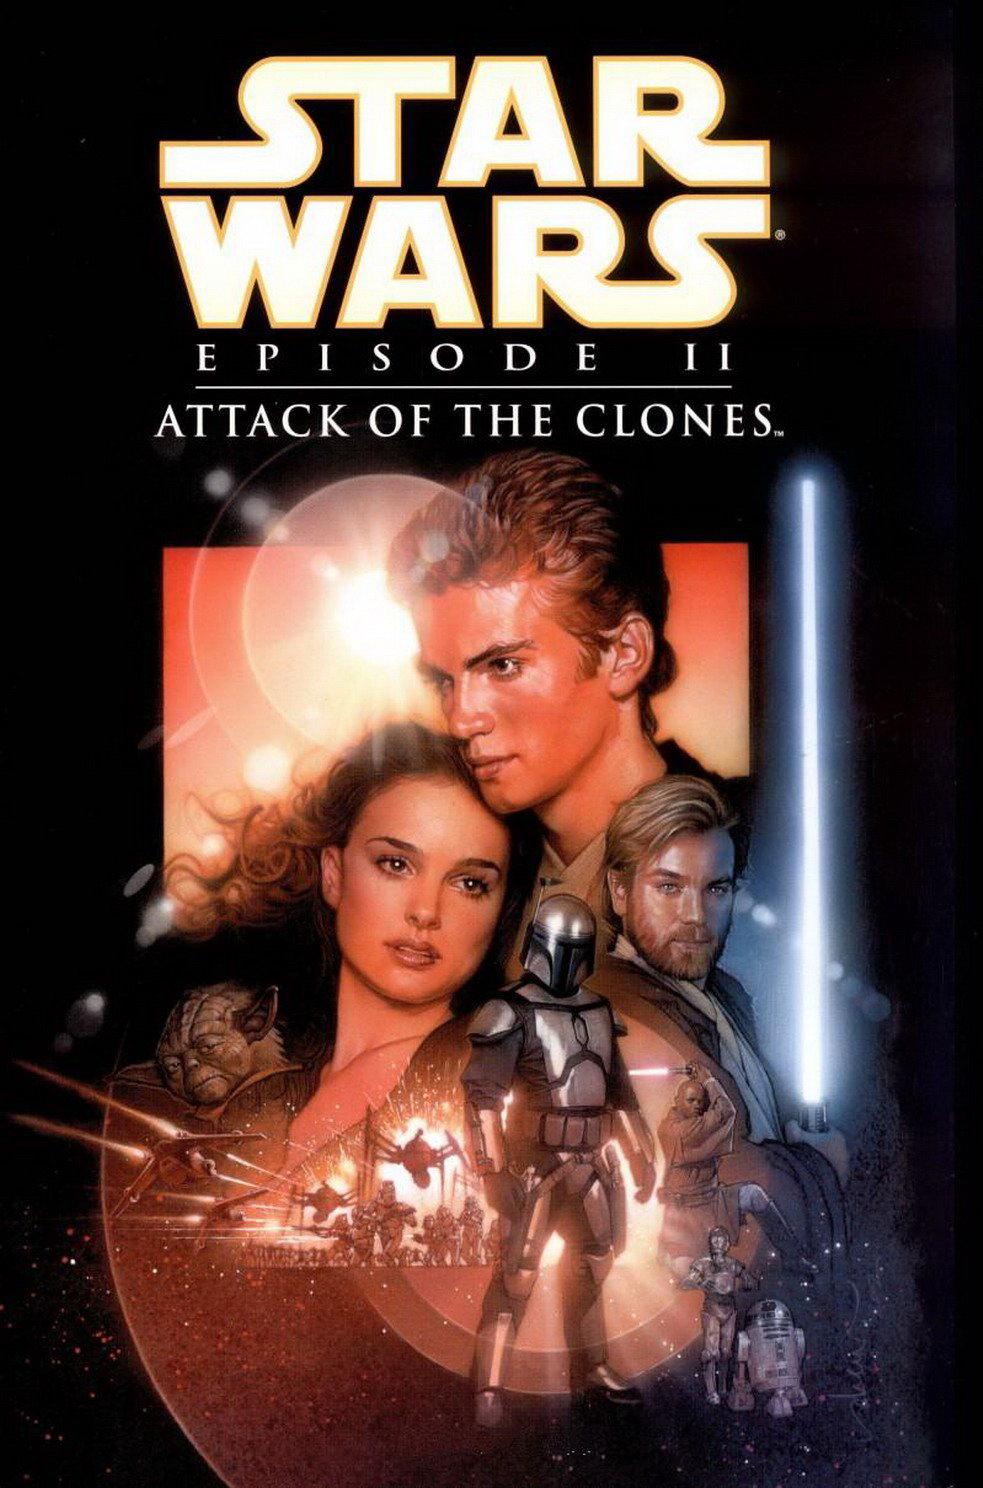 Episode 2, Attack of the Clones